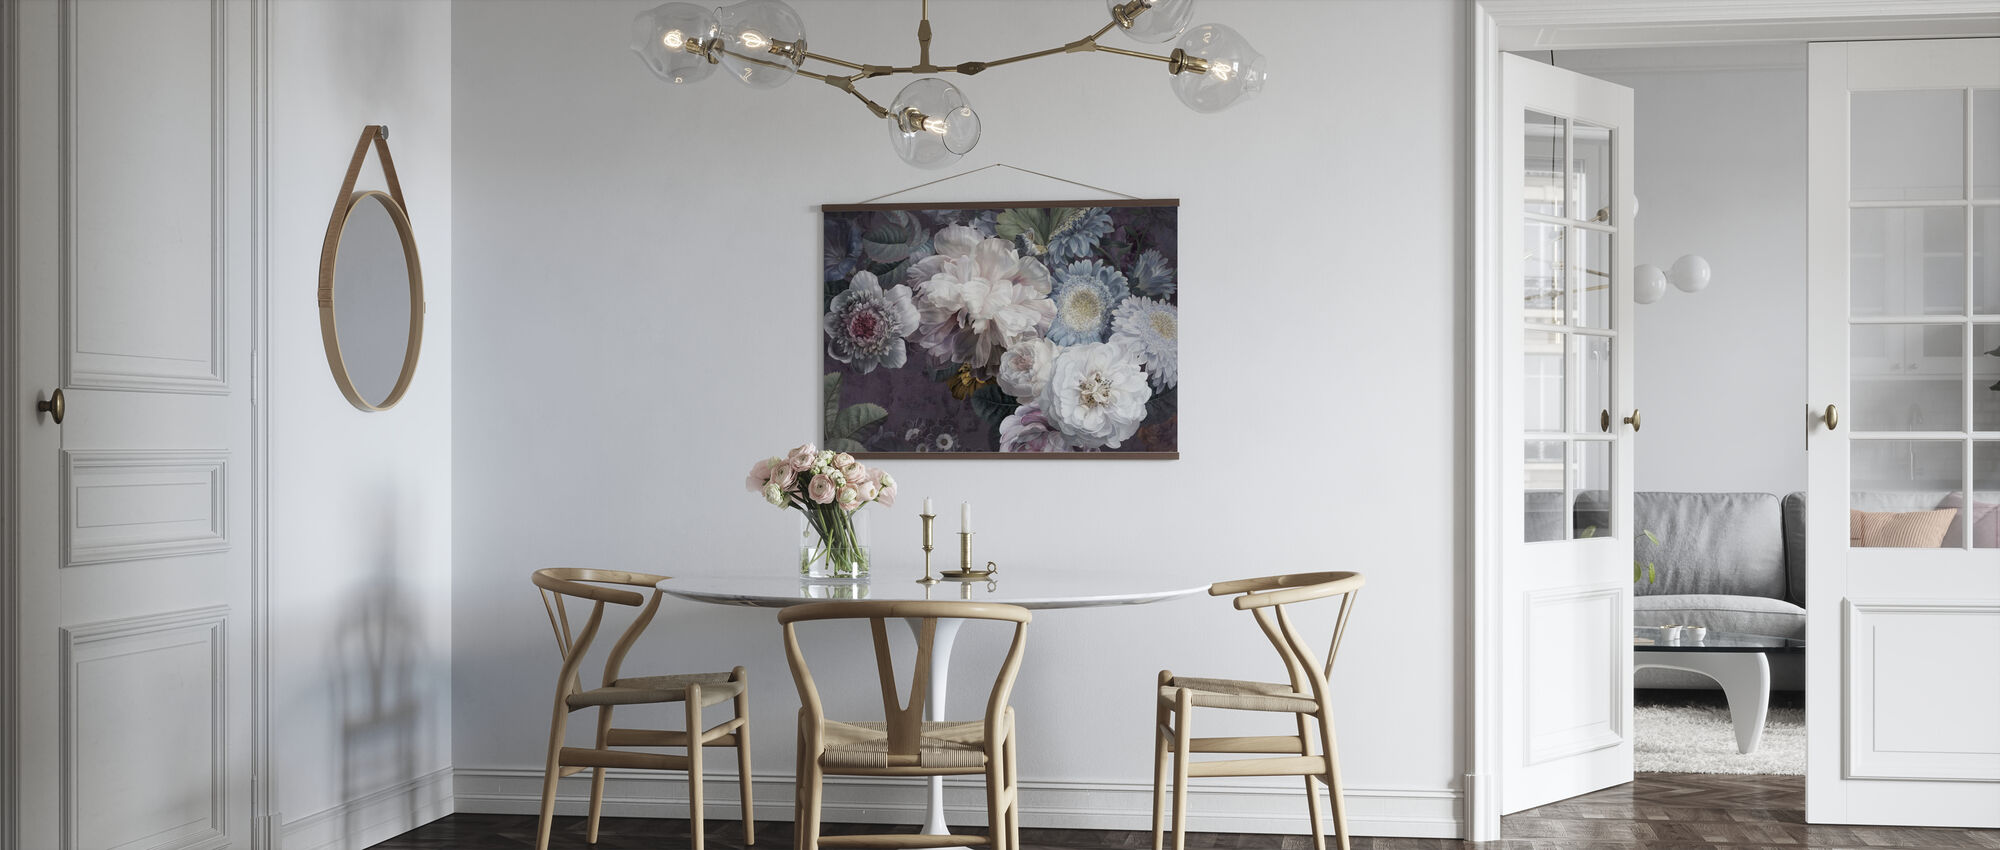 Lustre Arrangement - Purpur - Poster - Küchen